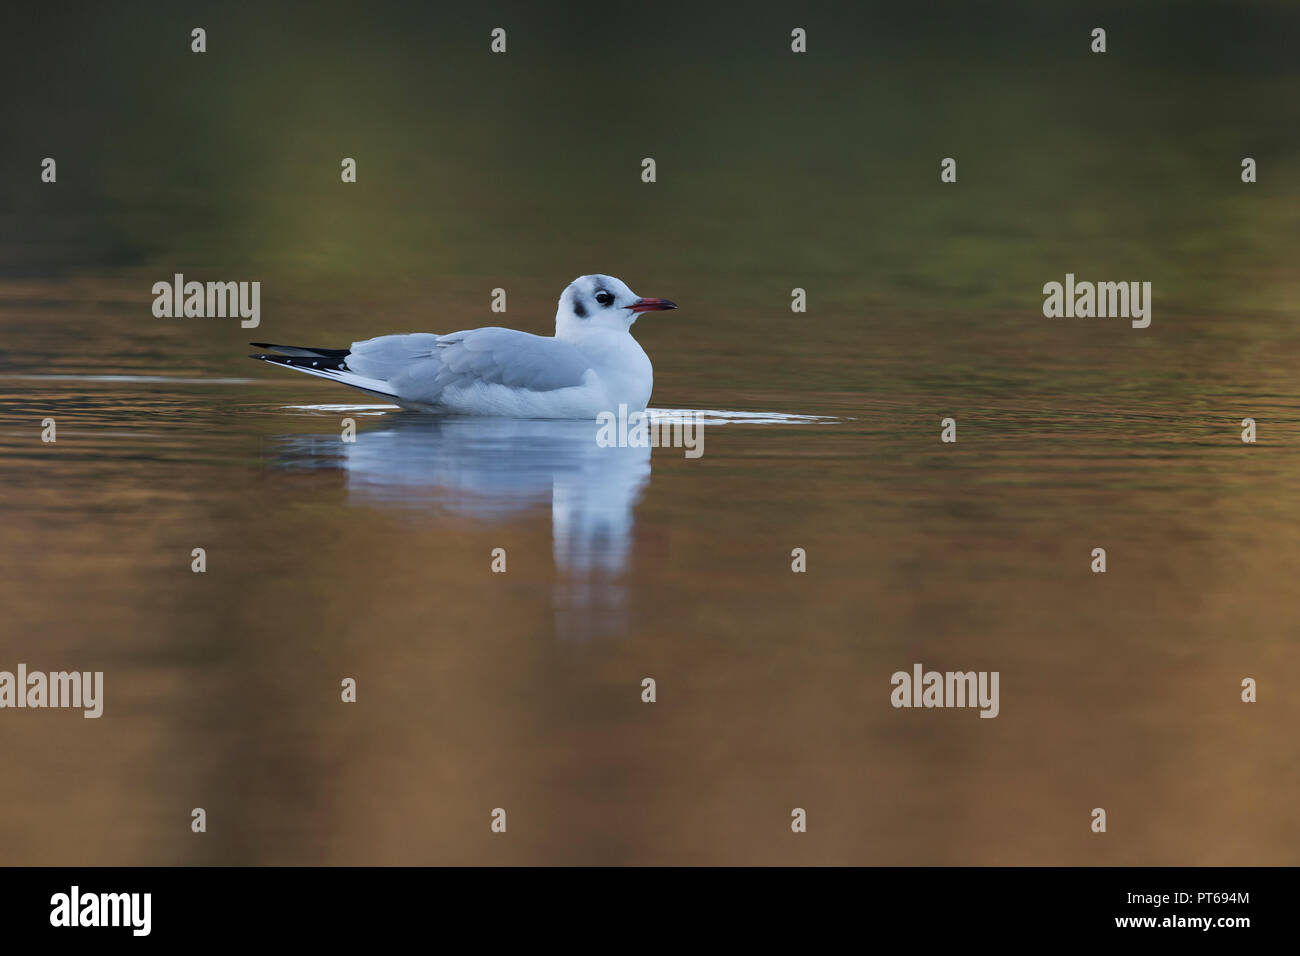 Black-headed gull Chroicocephalus ridibundus, winter adult, swimming on pond, Bradgate Park, Leicestershire, UK, December Stock Photo